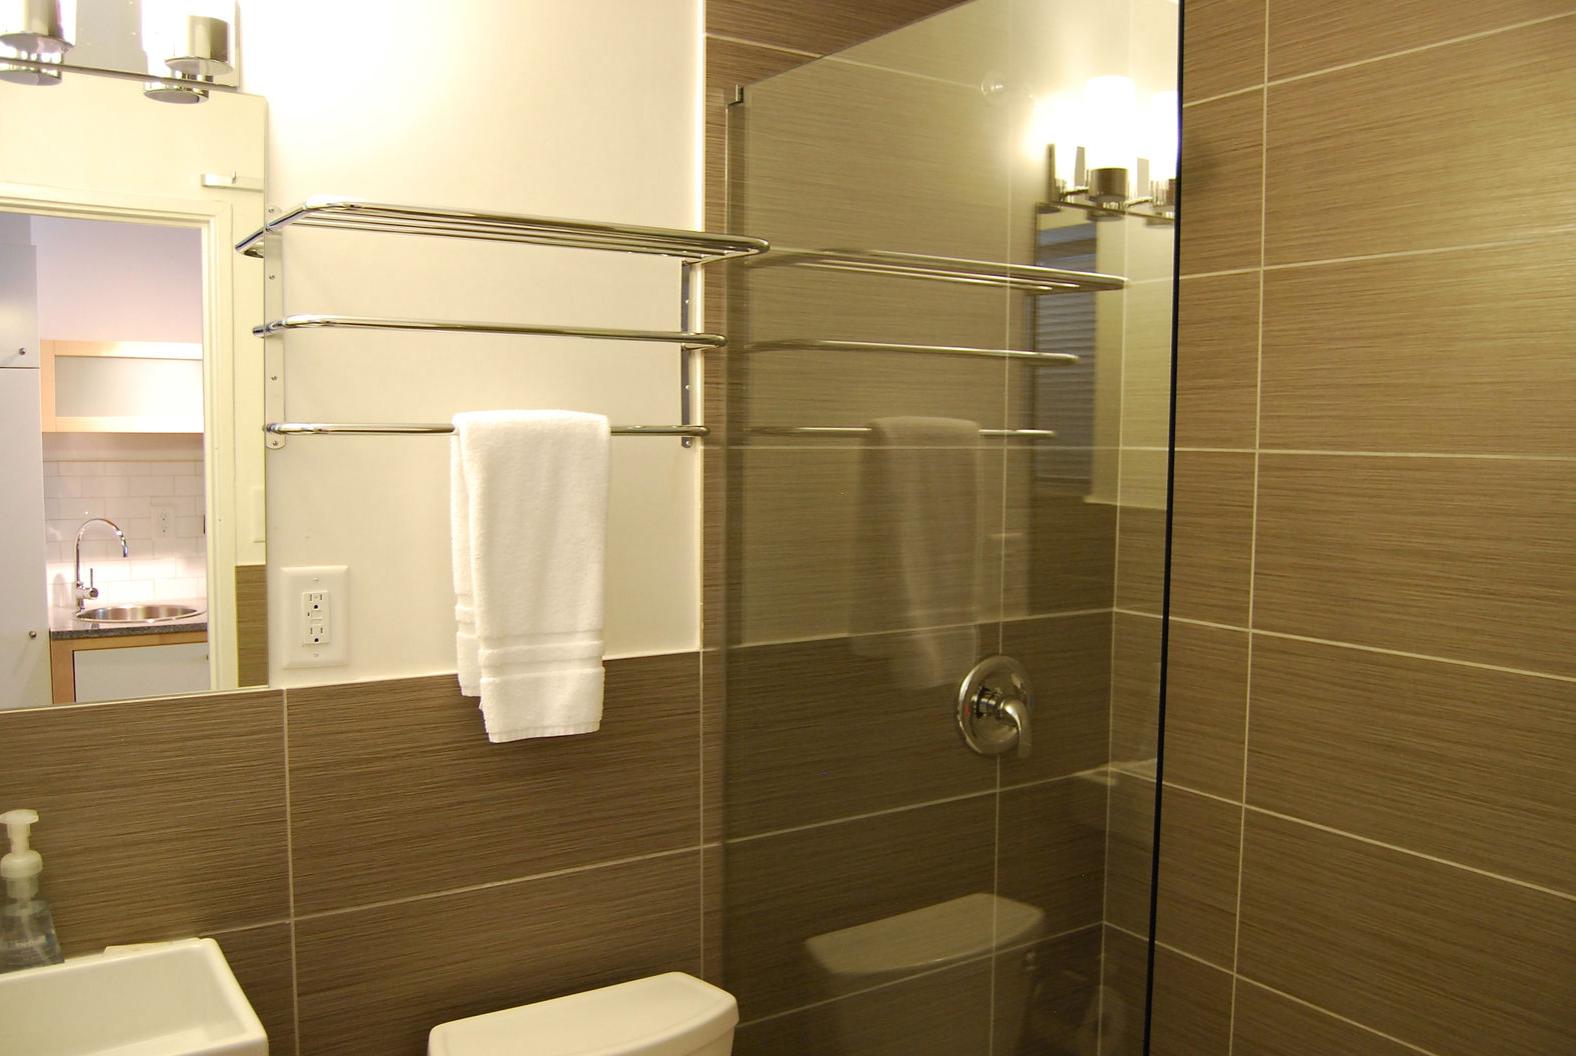 47 25th Street NW 13A , Atlanta, Georgia, 30309 Bathroom 866-500-4576